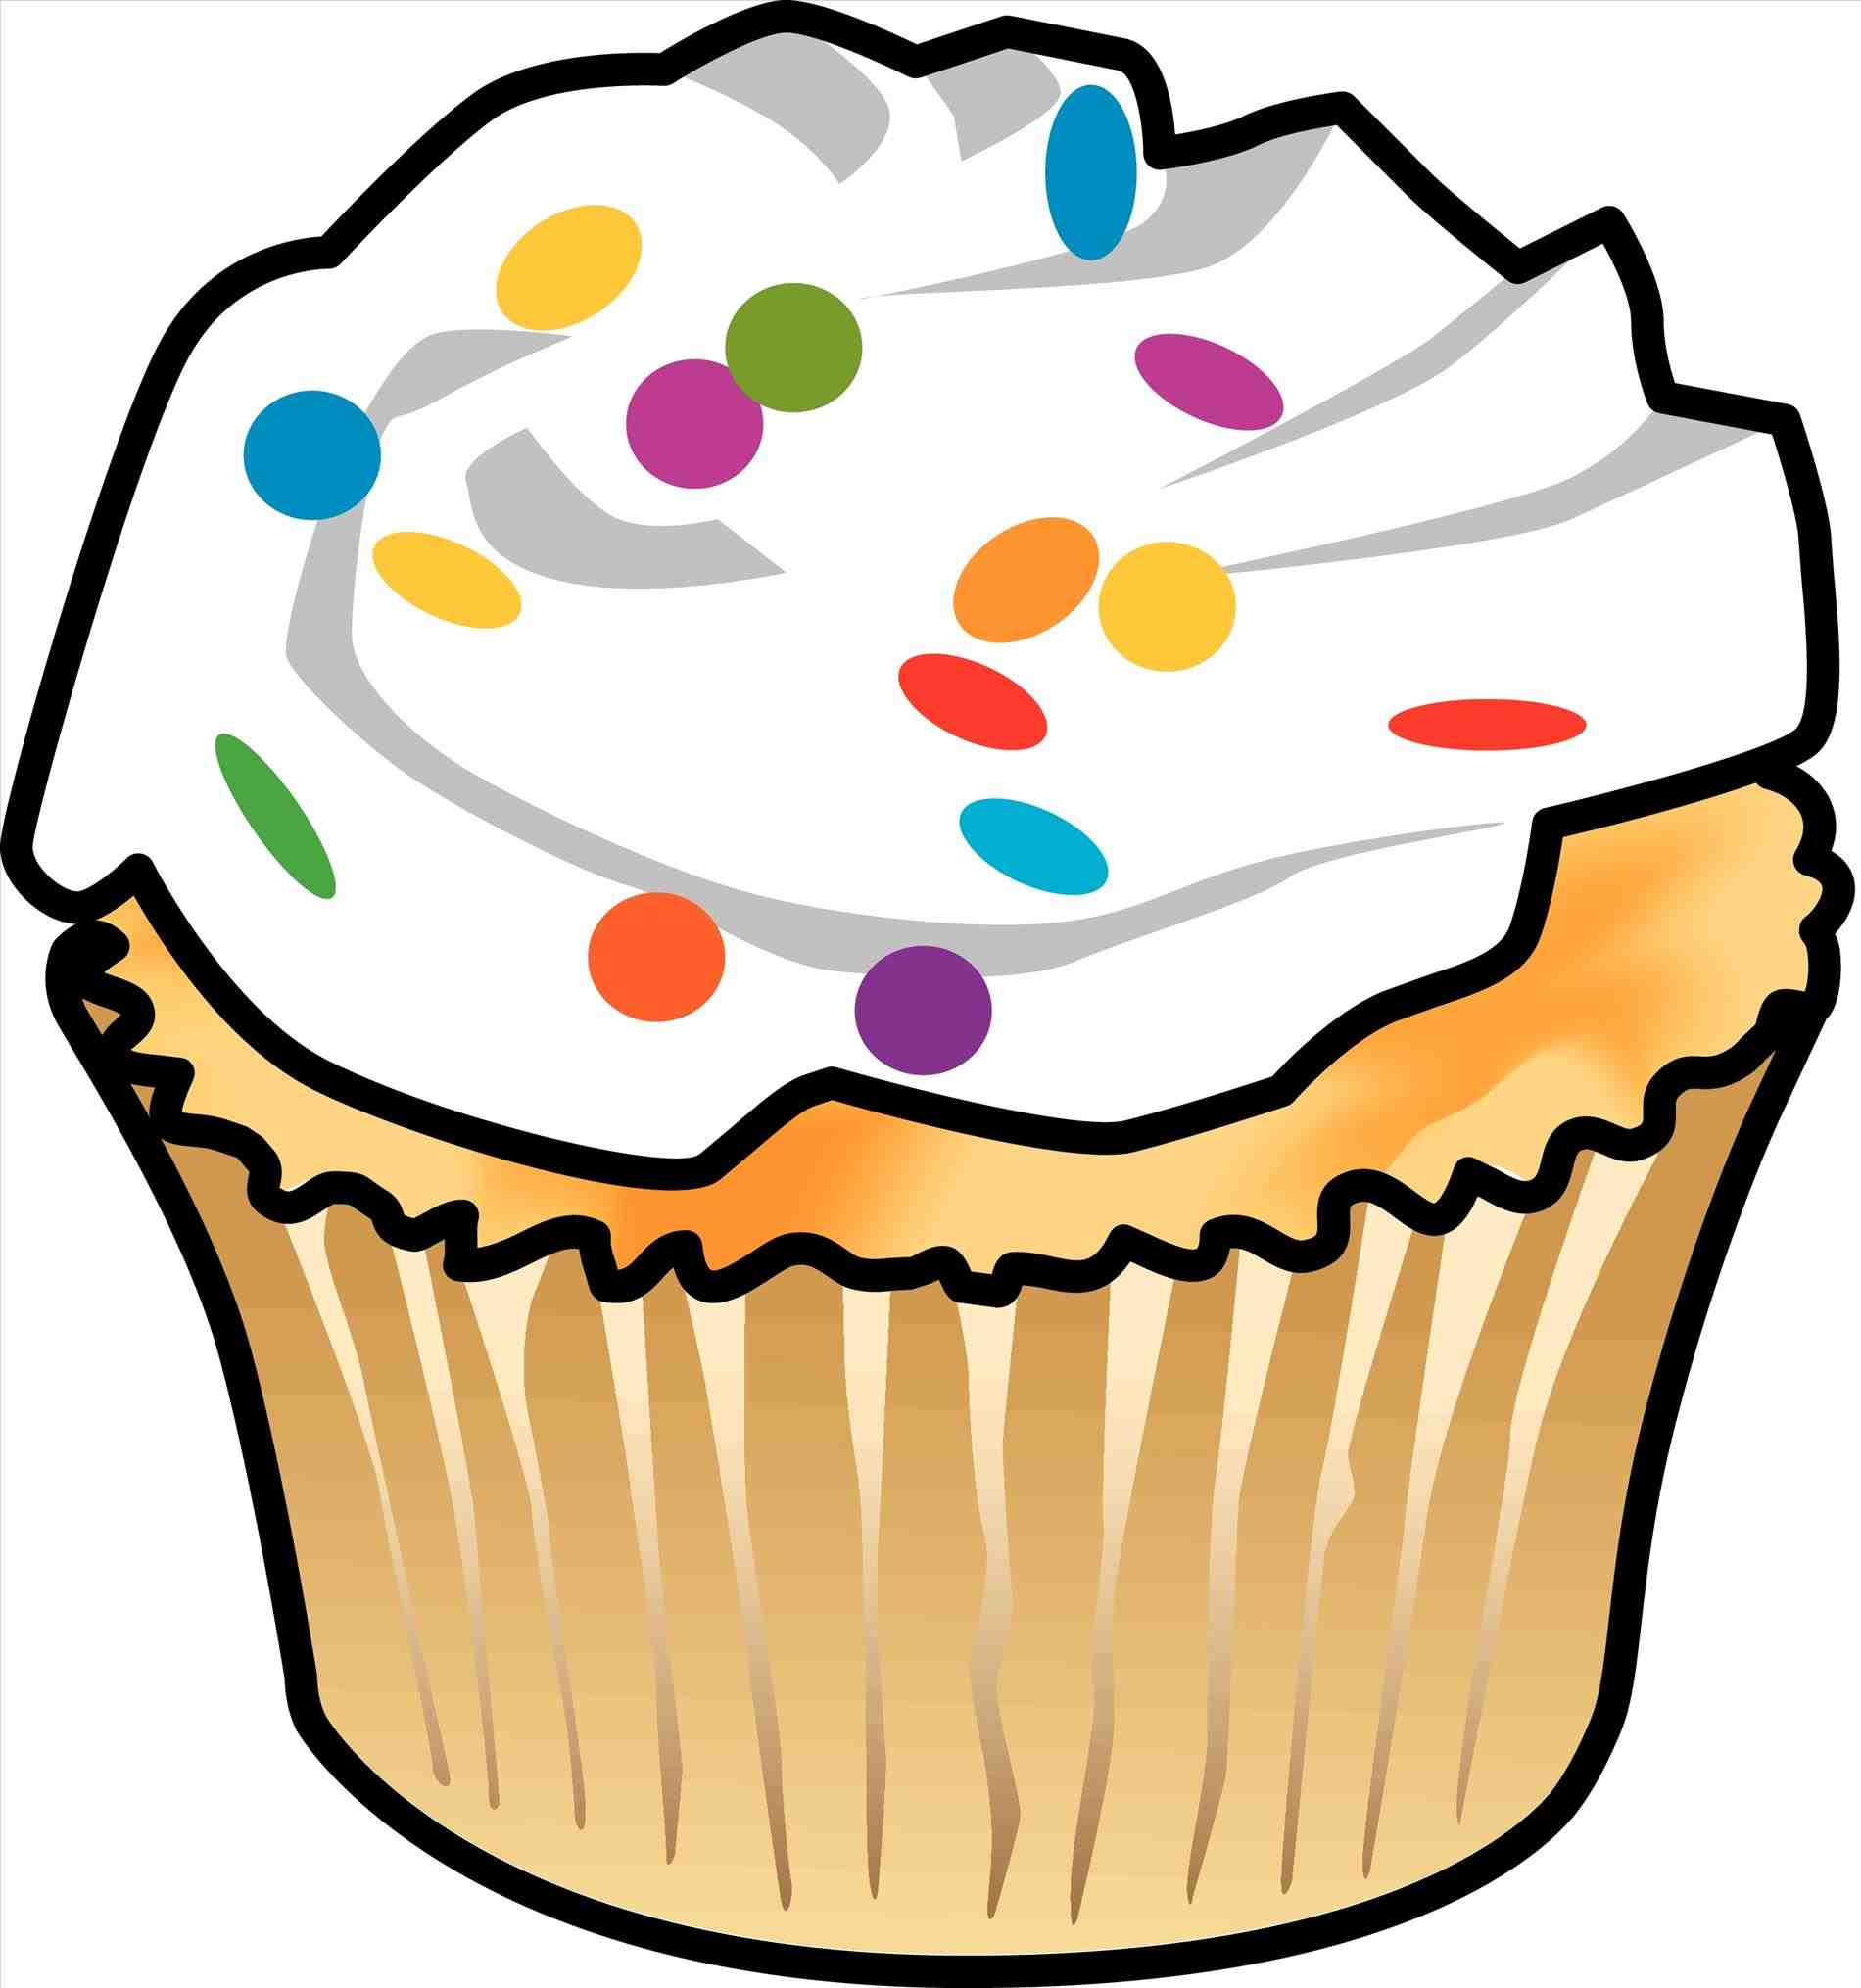 1900x2030 Christmas Cupcake Clipart Cheminee.website